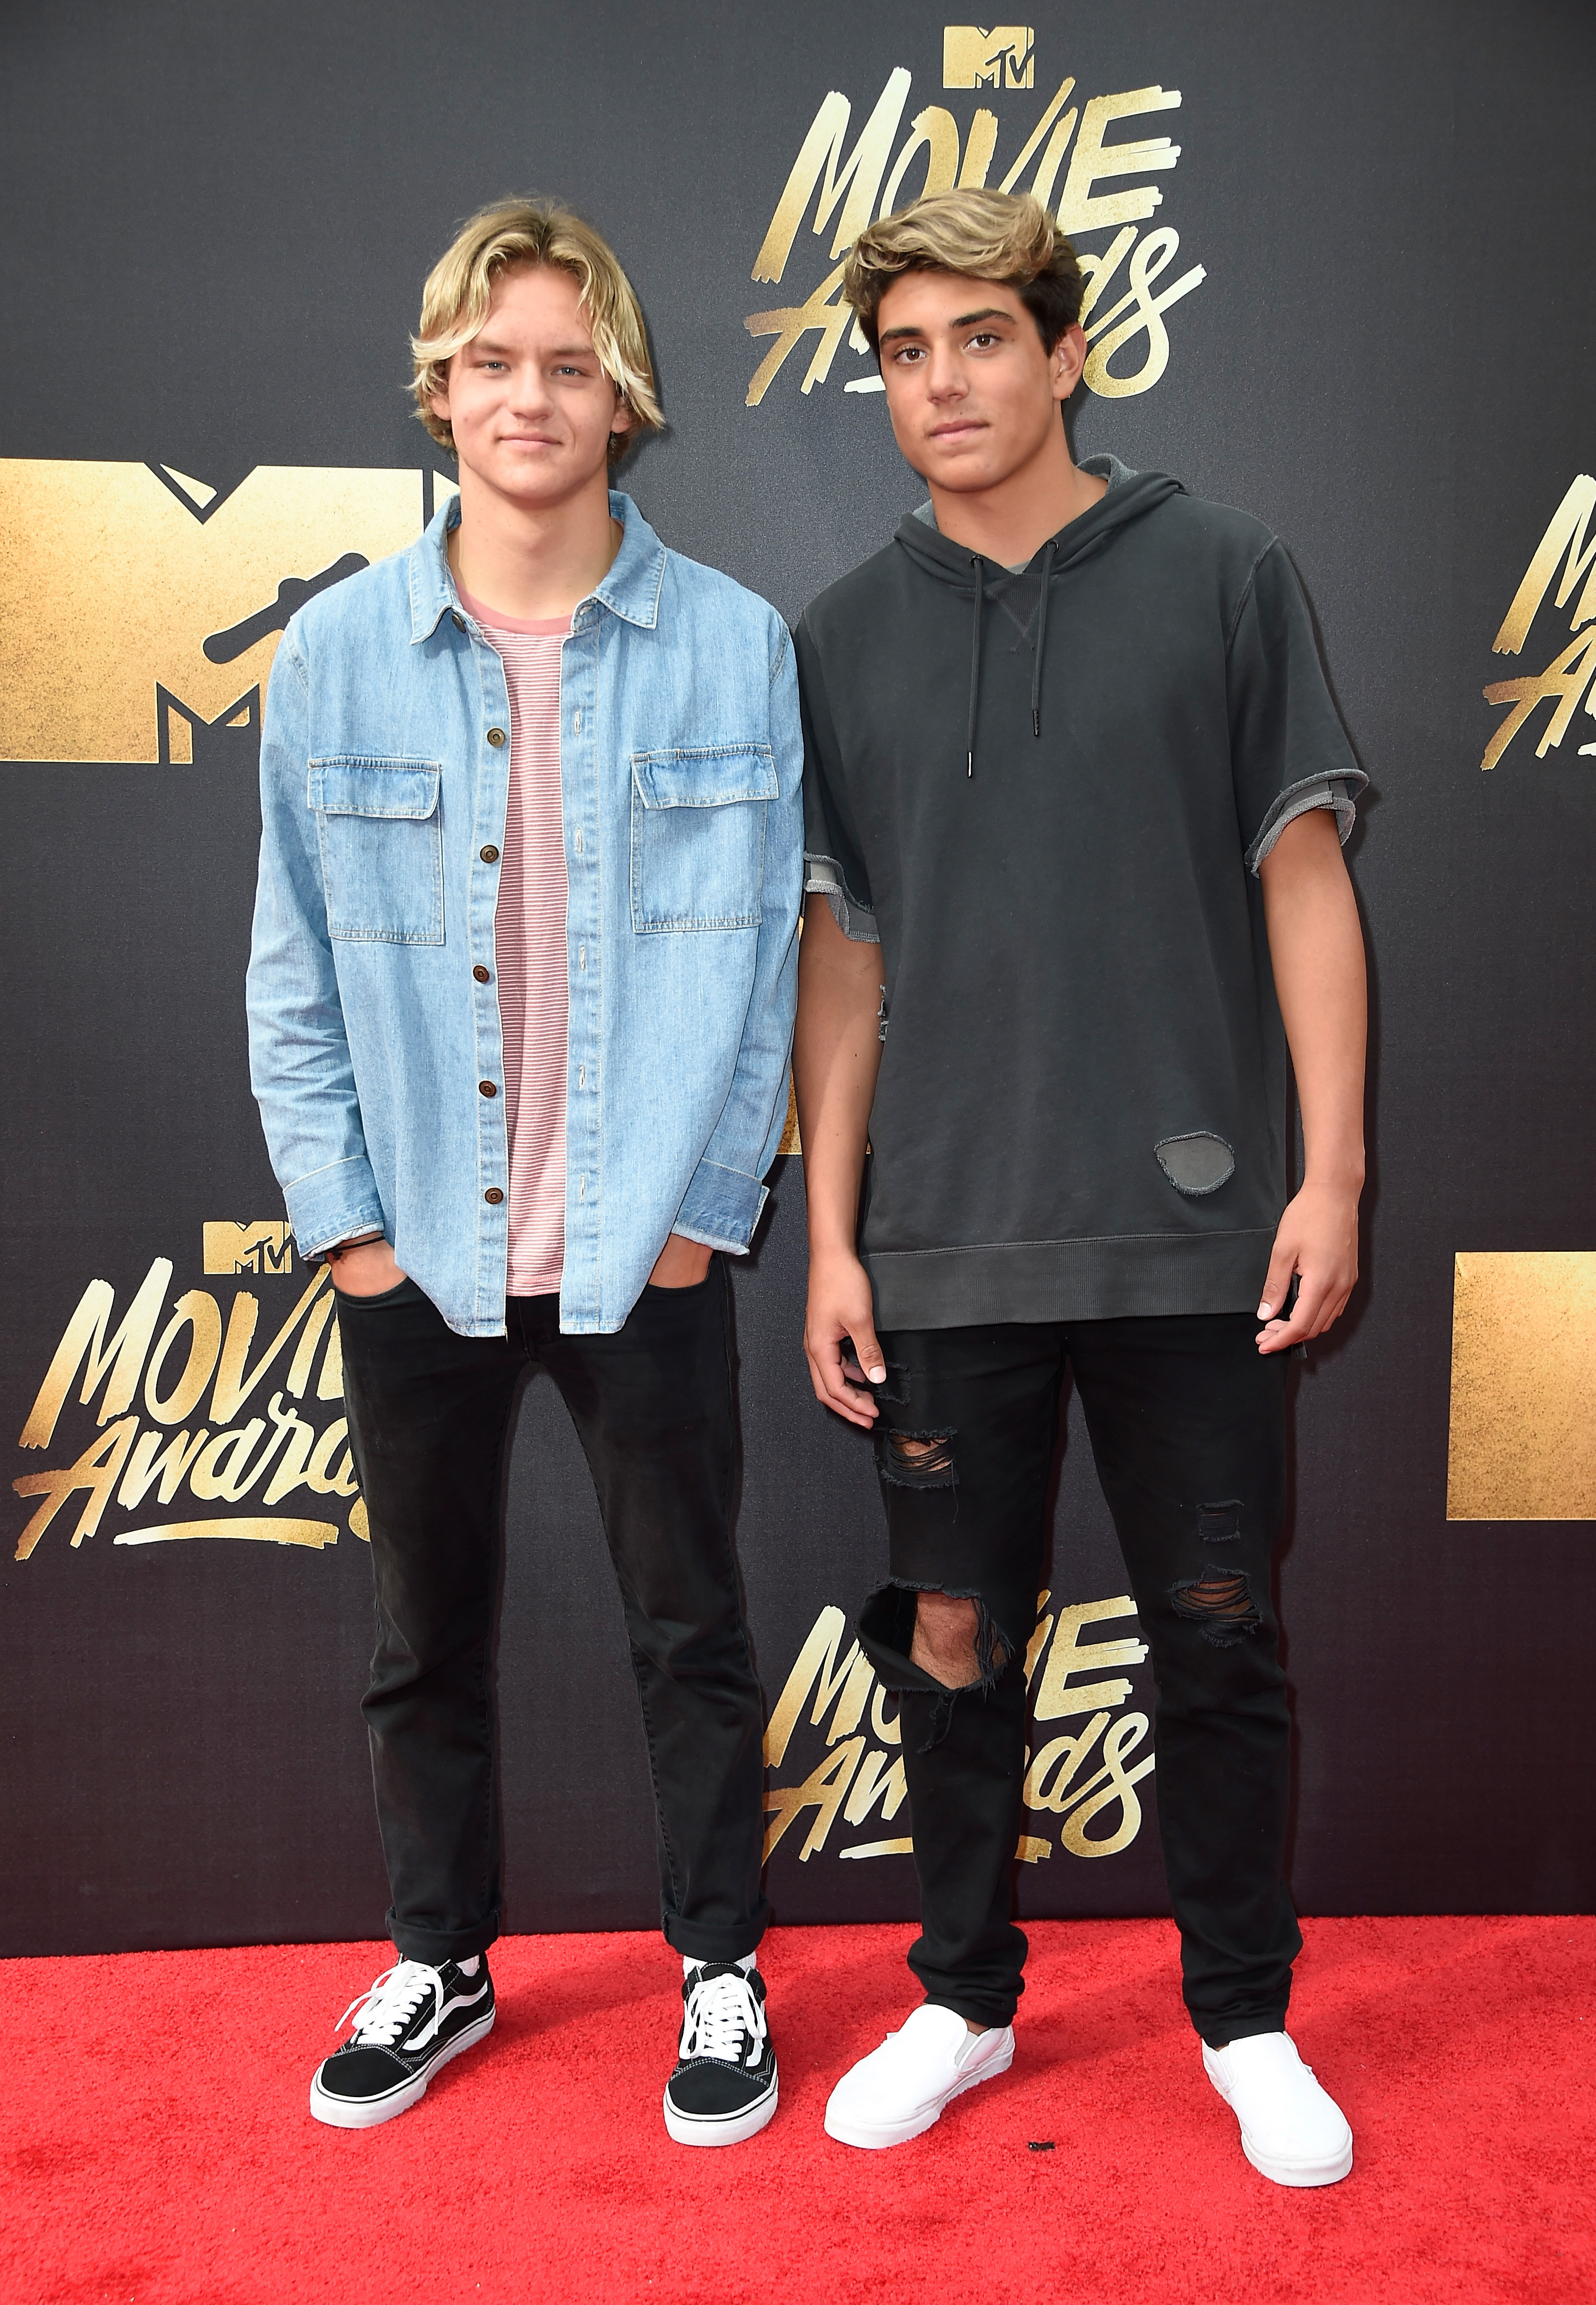 Joshua Holz and Daniel Lara attend the 2016 MTV Movie Awards at Warner Bros. Studios on April 9, 2016 in Burbank, Calif.